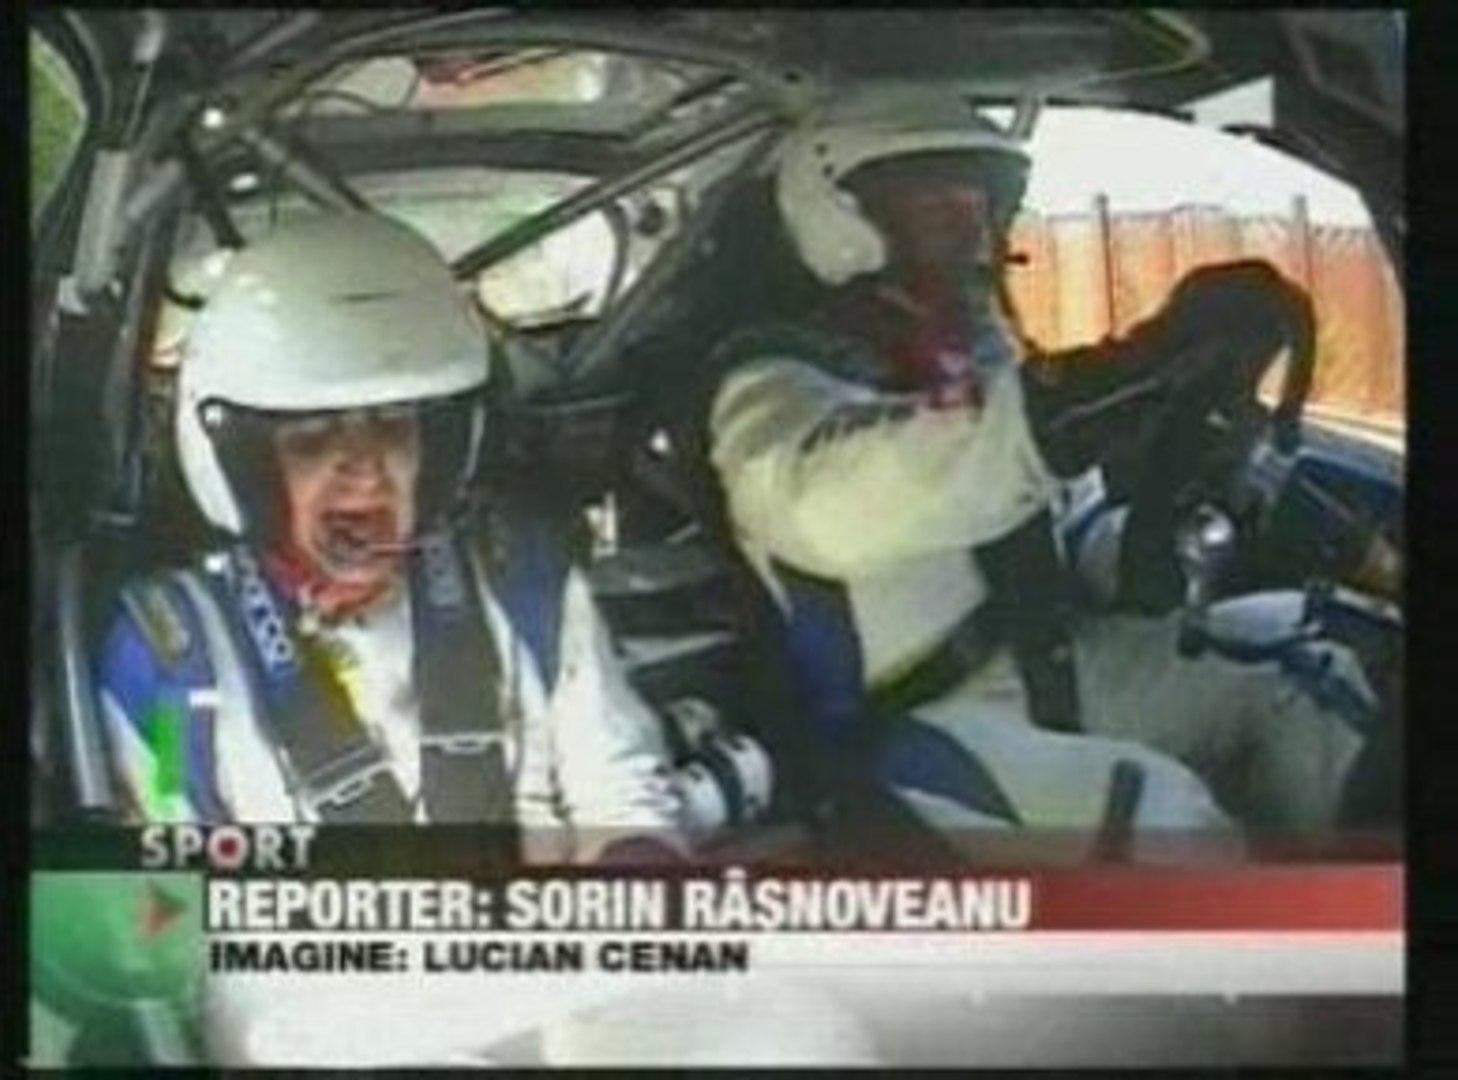 Sport - 16.06.2009